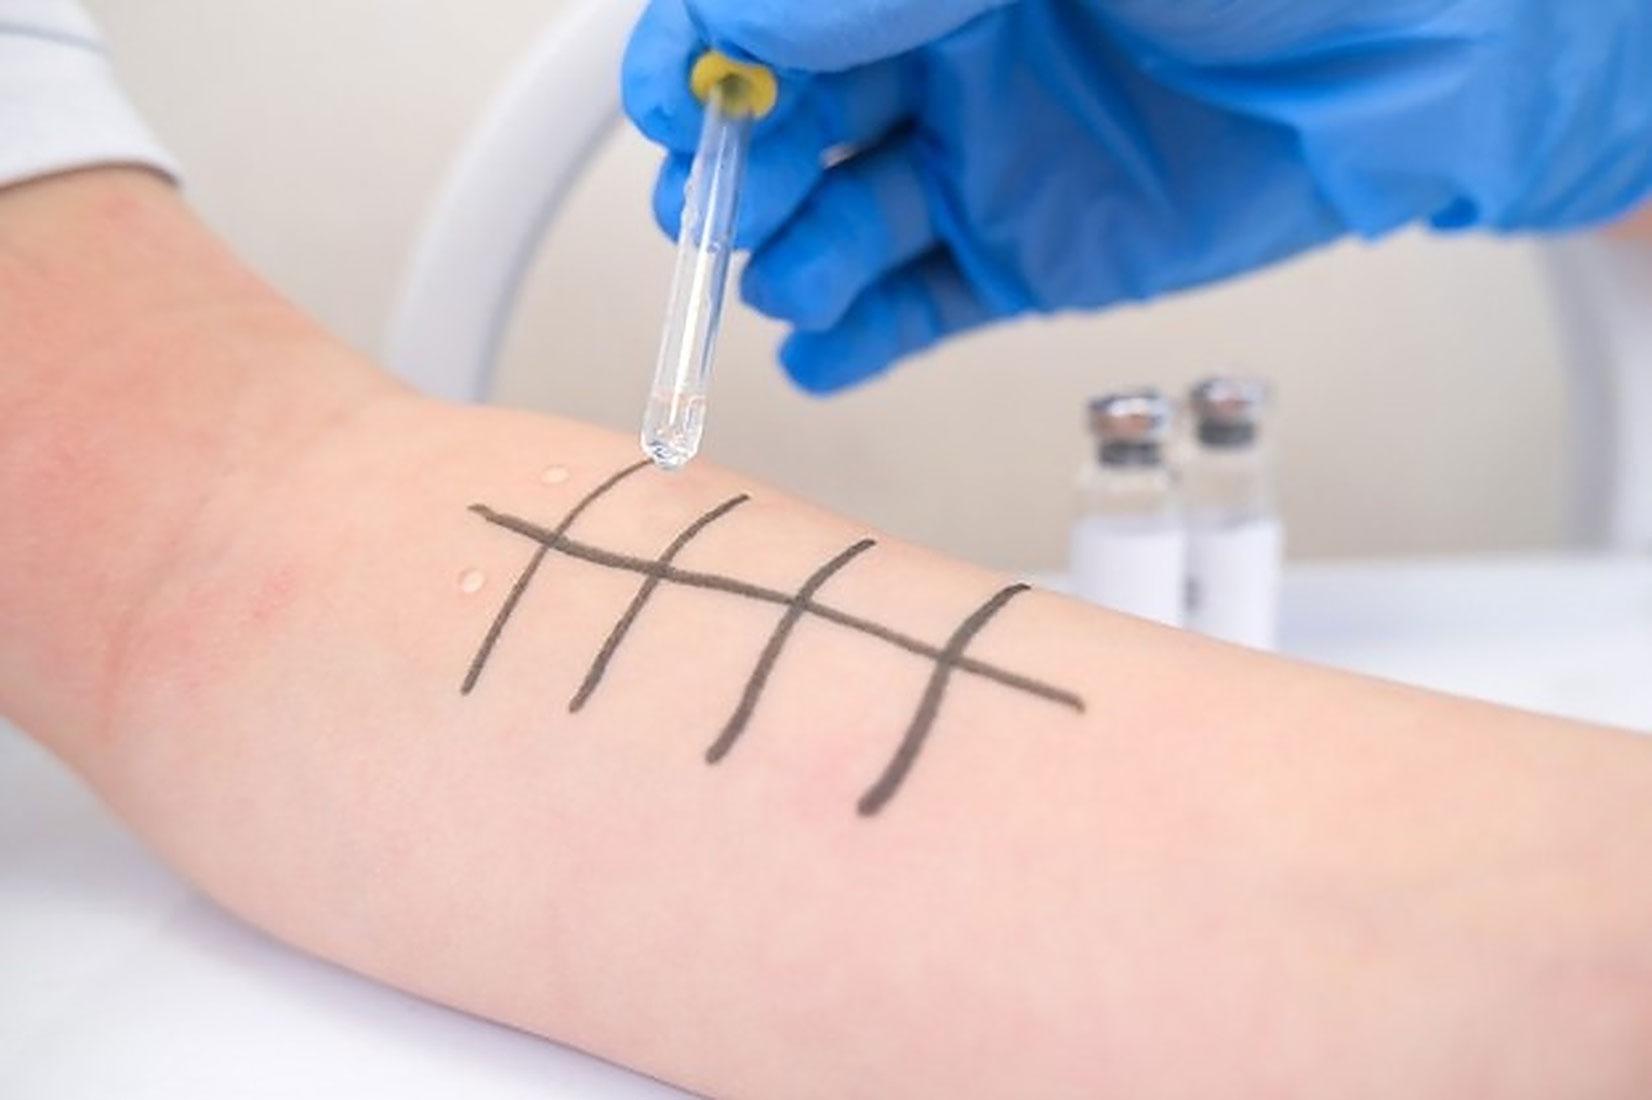 tes-alergi-skin-prick-test-klinik-tht